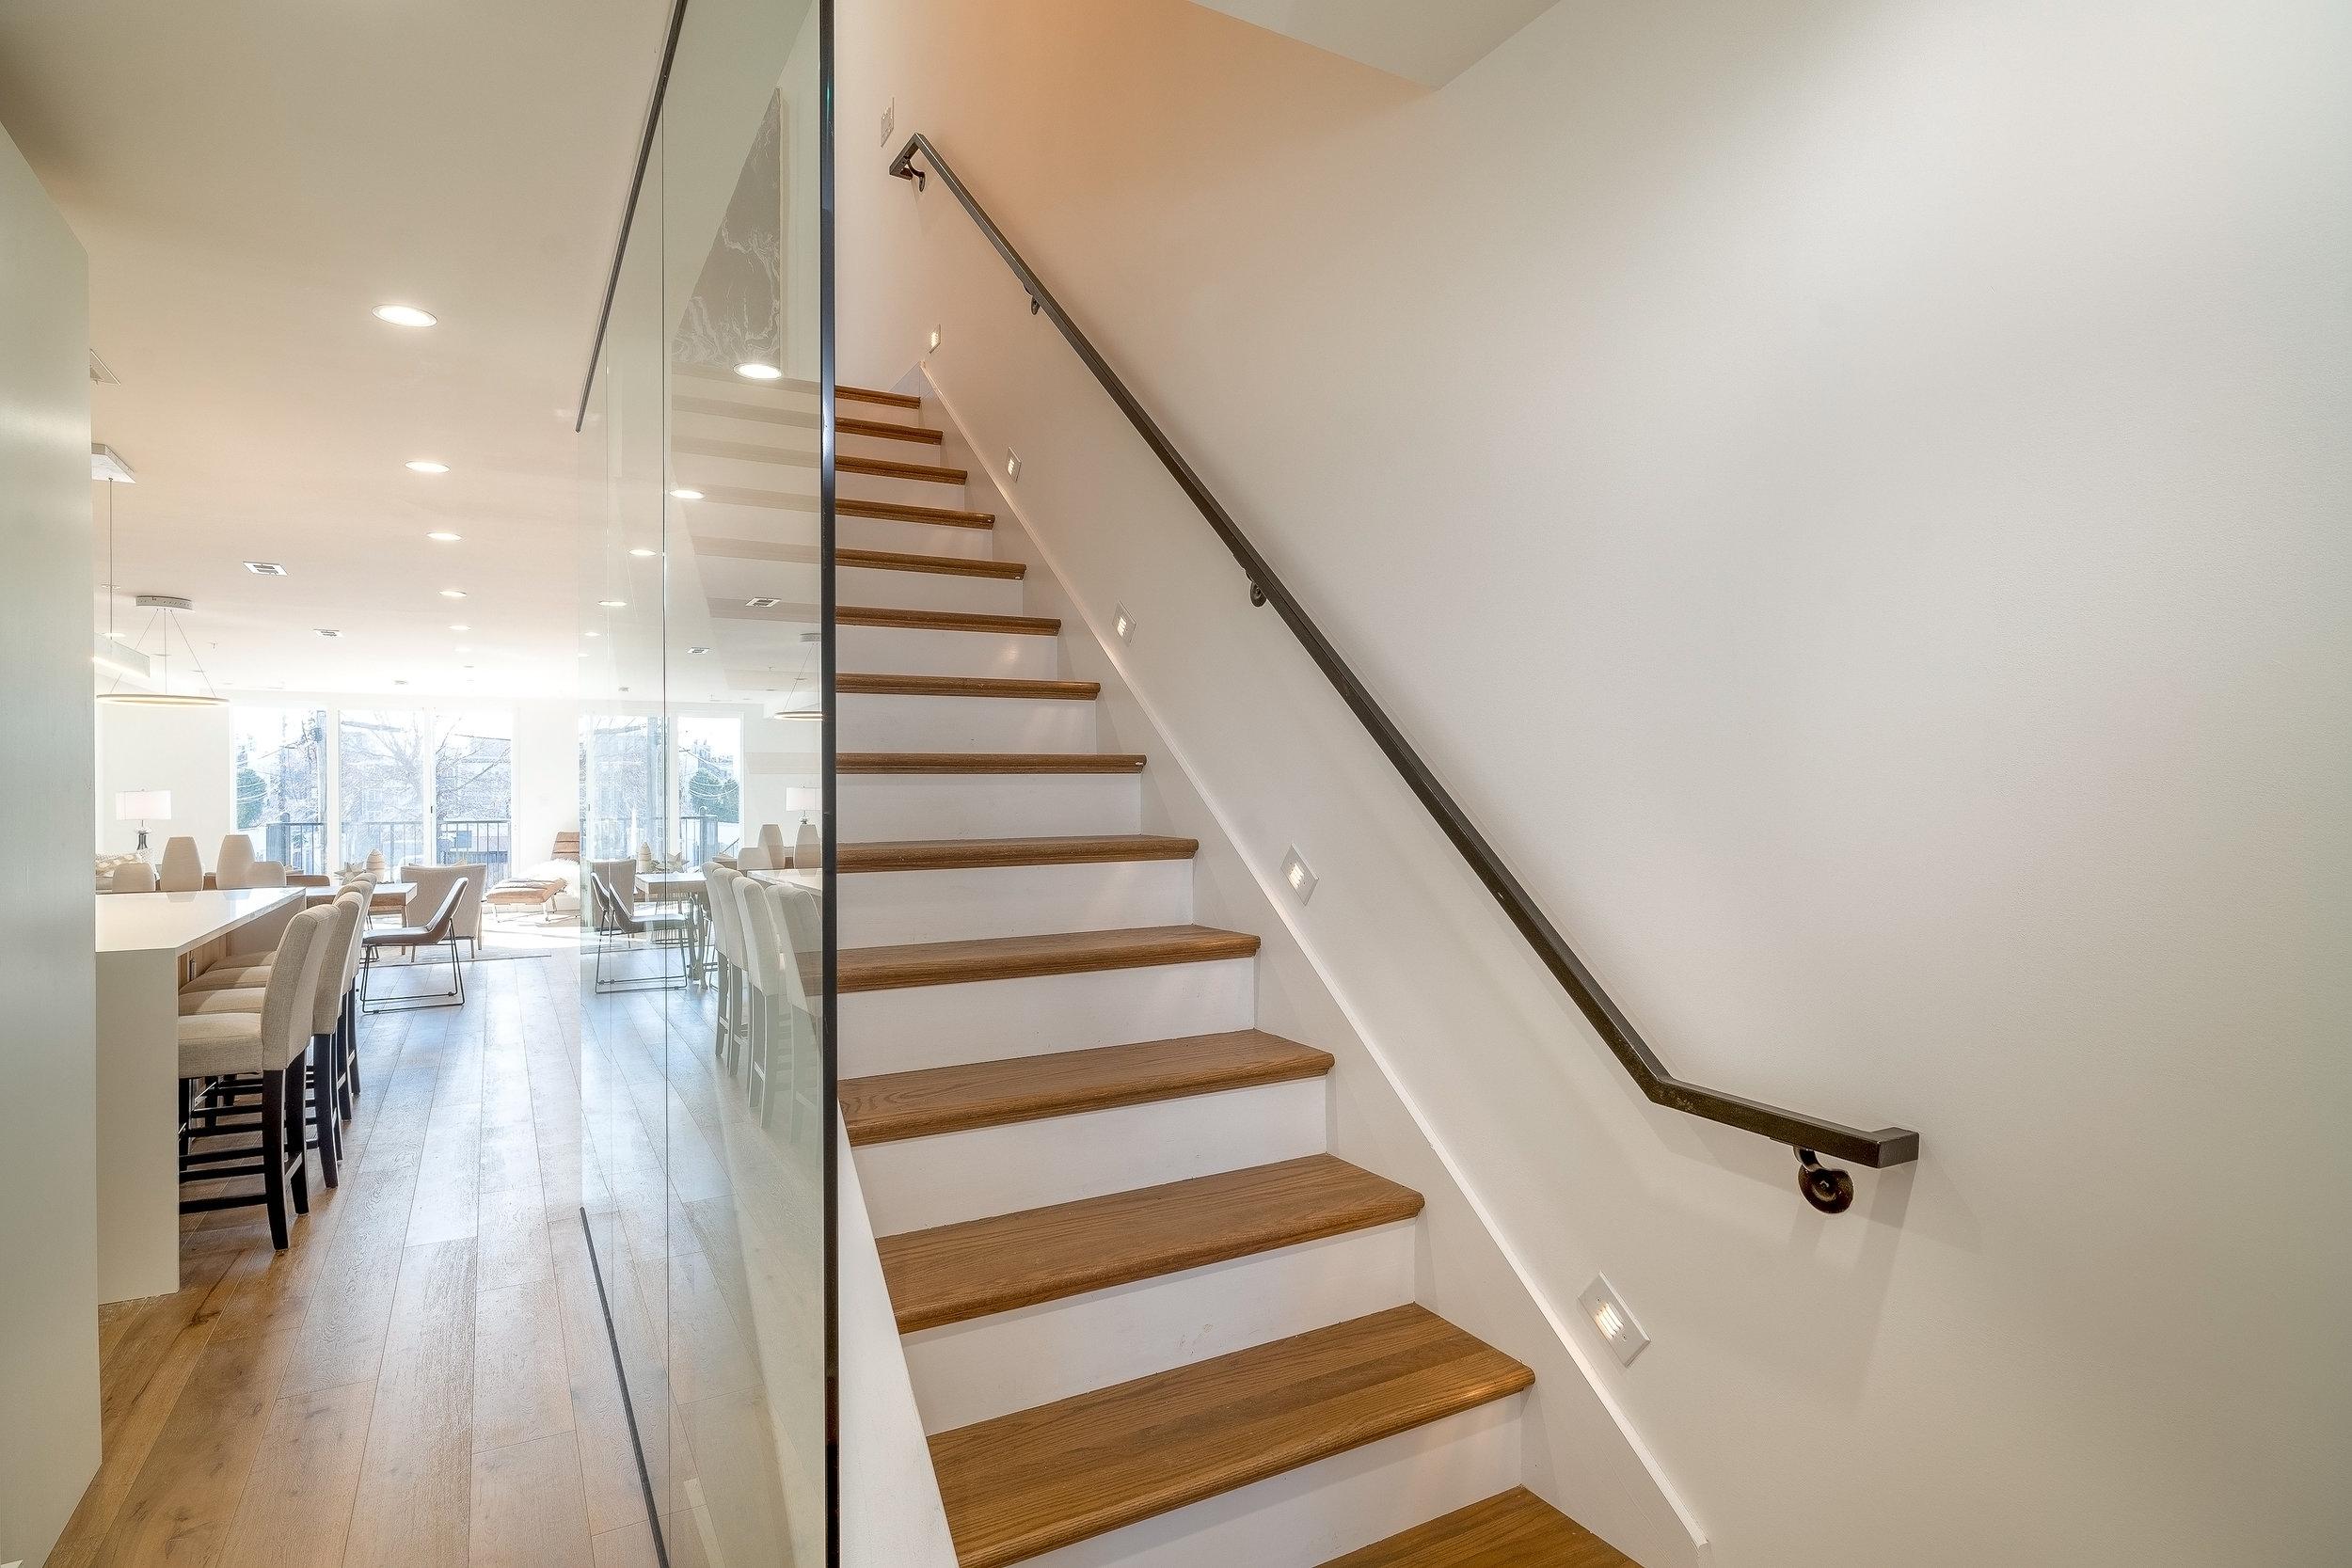 Staircase01 (1).jpg